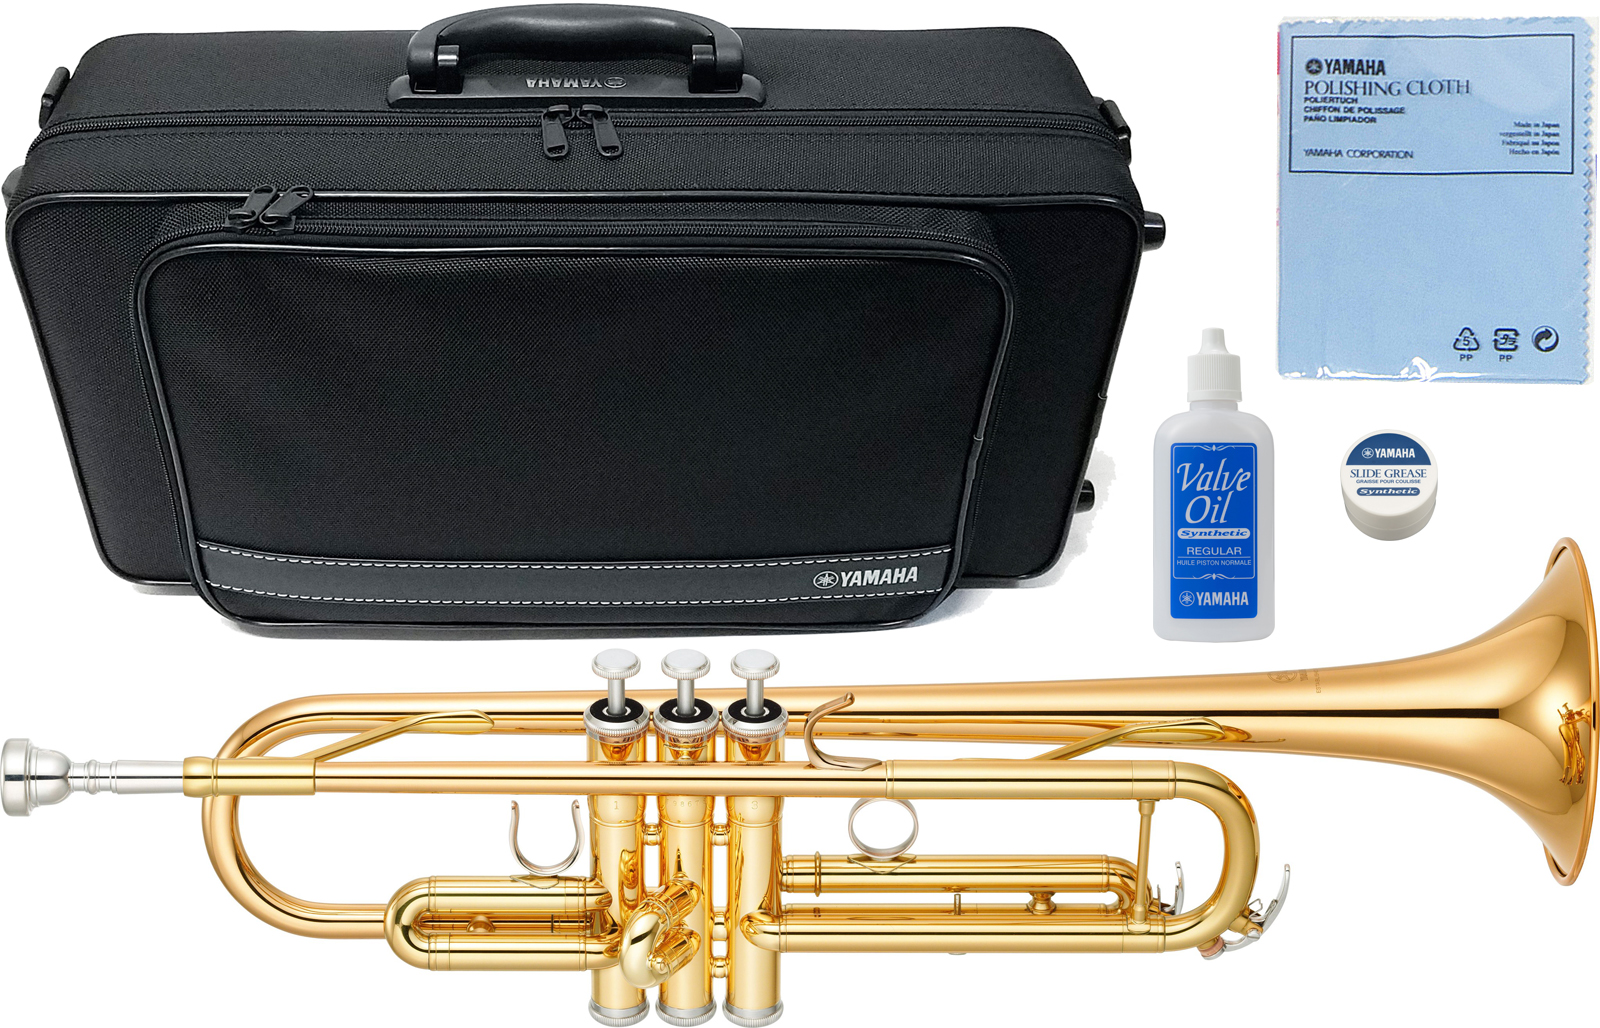 YAMAHA ( ヤマハ ) YTR-4335G2 トランペット 新品 ゴールドブラス B♭ YTR-4335GII Trumpets gold YTR-4335G-2-01 北海道 沖縄 離島不可